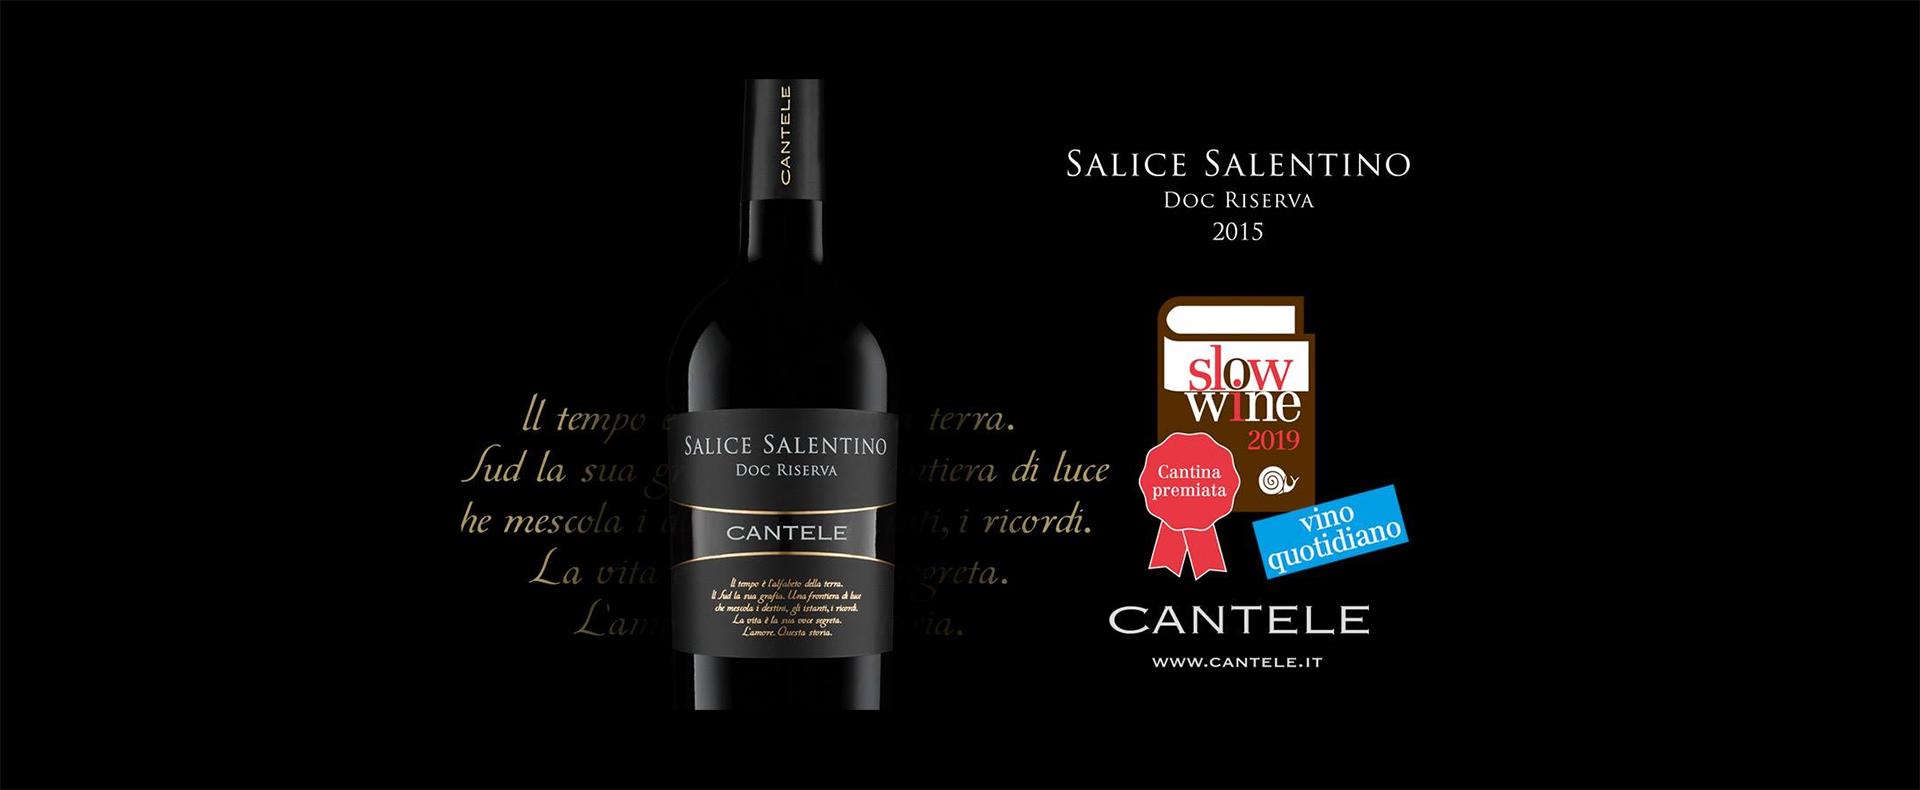 "Cantele Salice Salentino wins Slow Wine award for ""daily wine"""